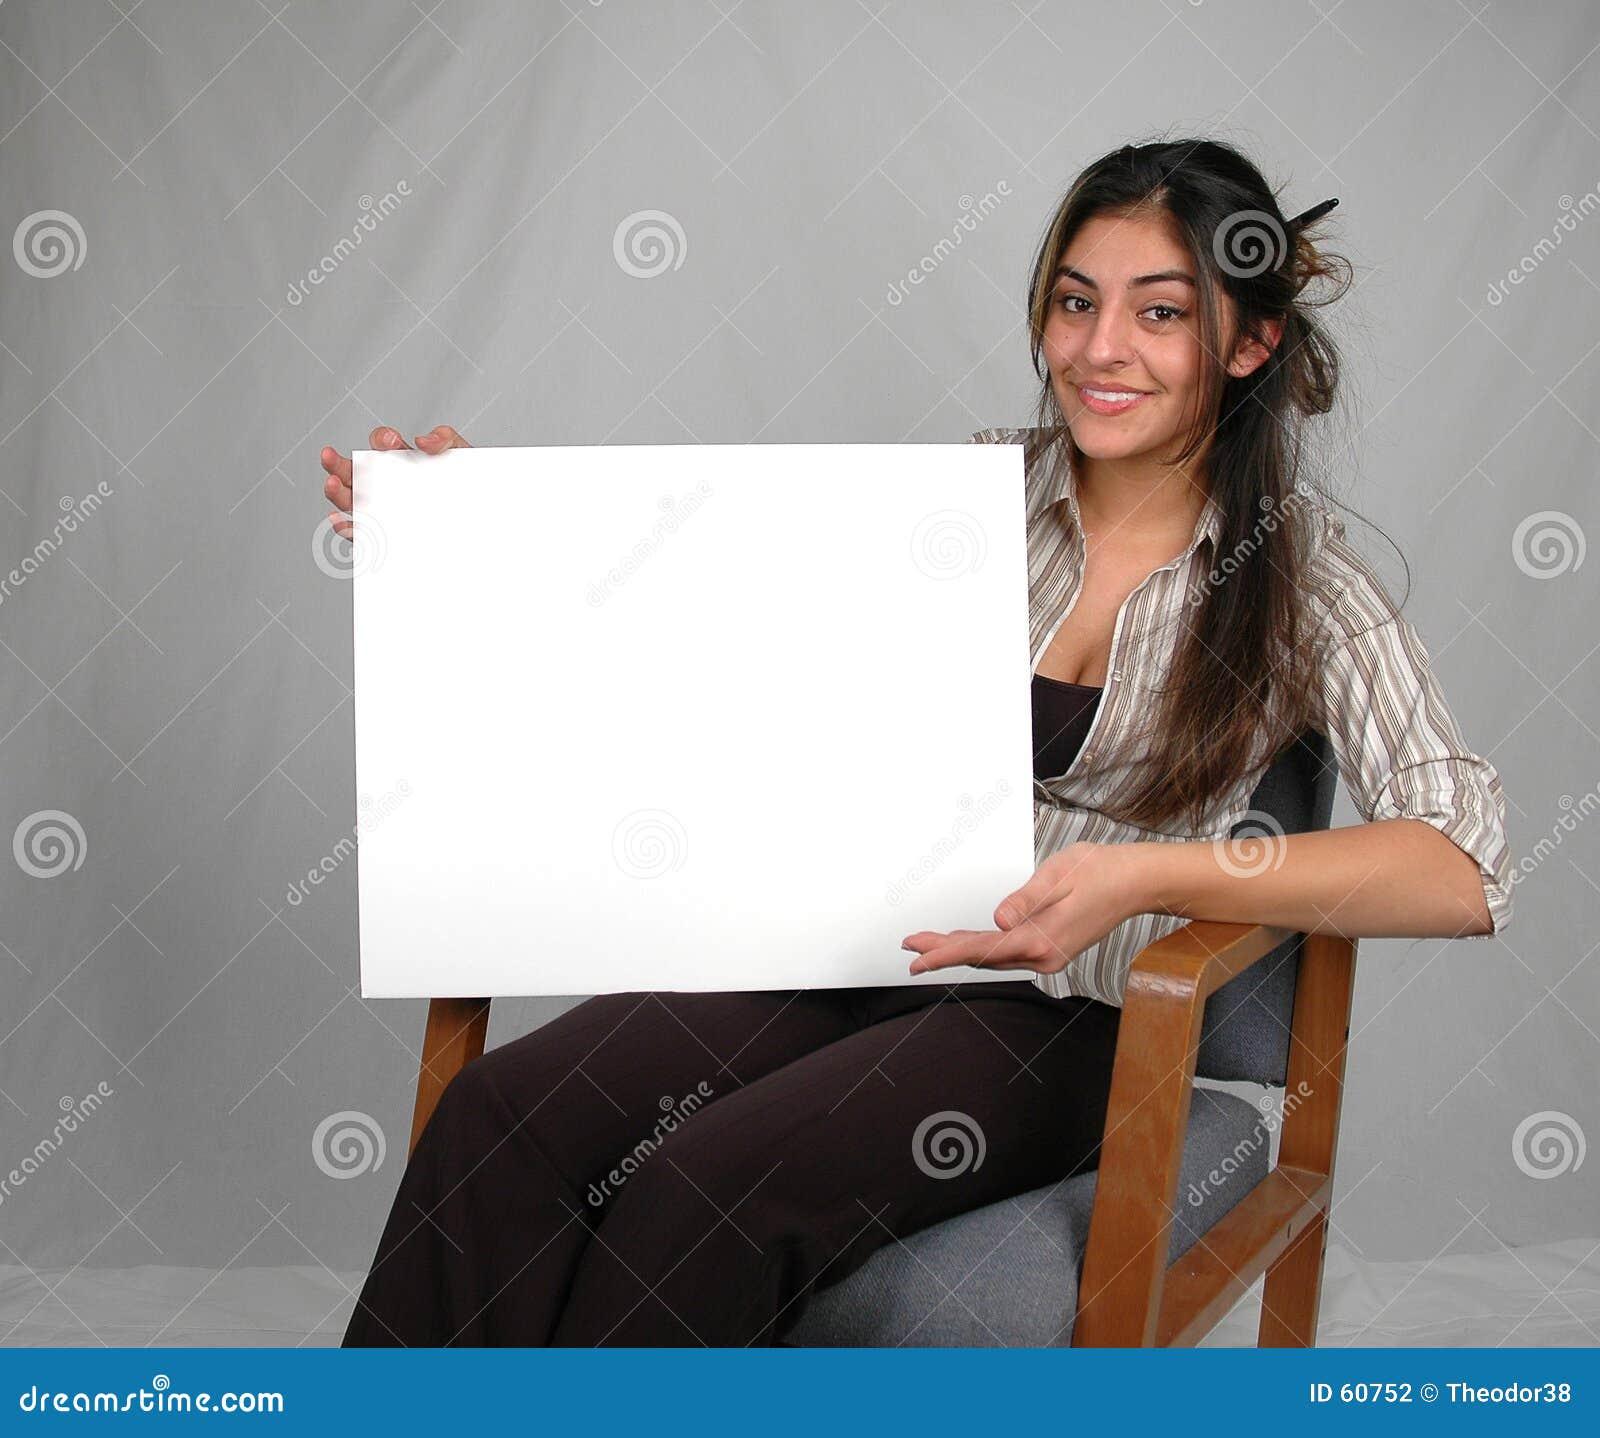 Unbelegtes board-10